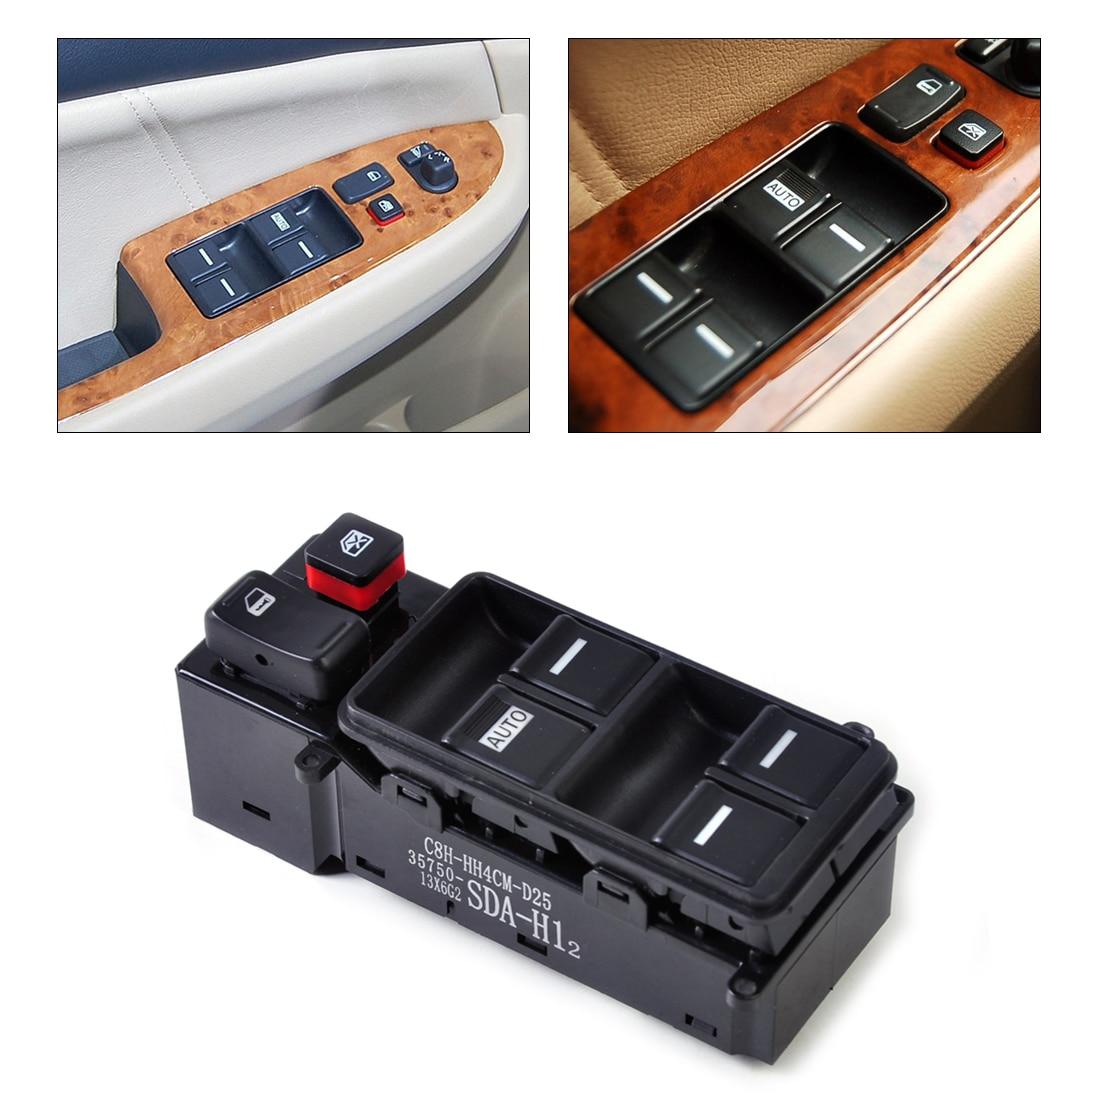 Driver Side Power Window Switch 35750-SDA-H12 for 2003-2007 Honda Accord Sedan